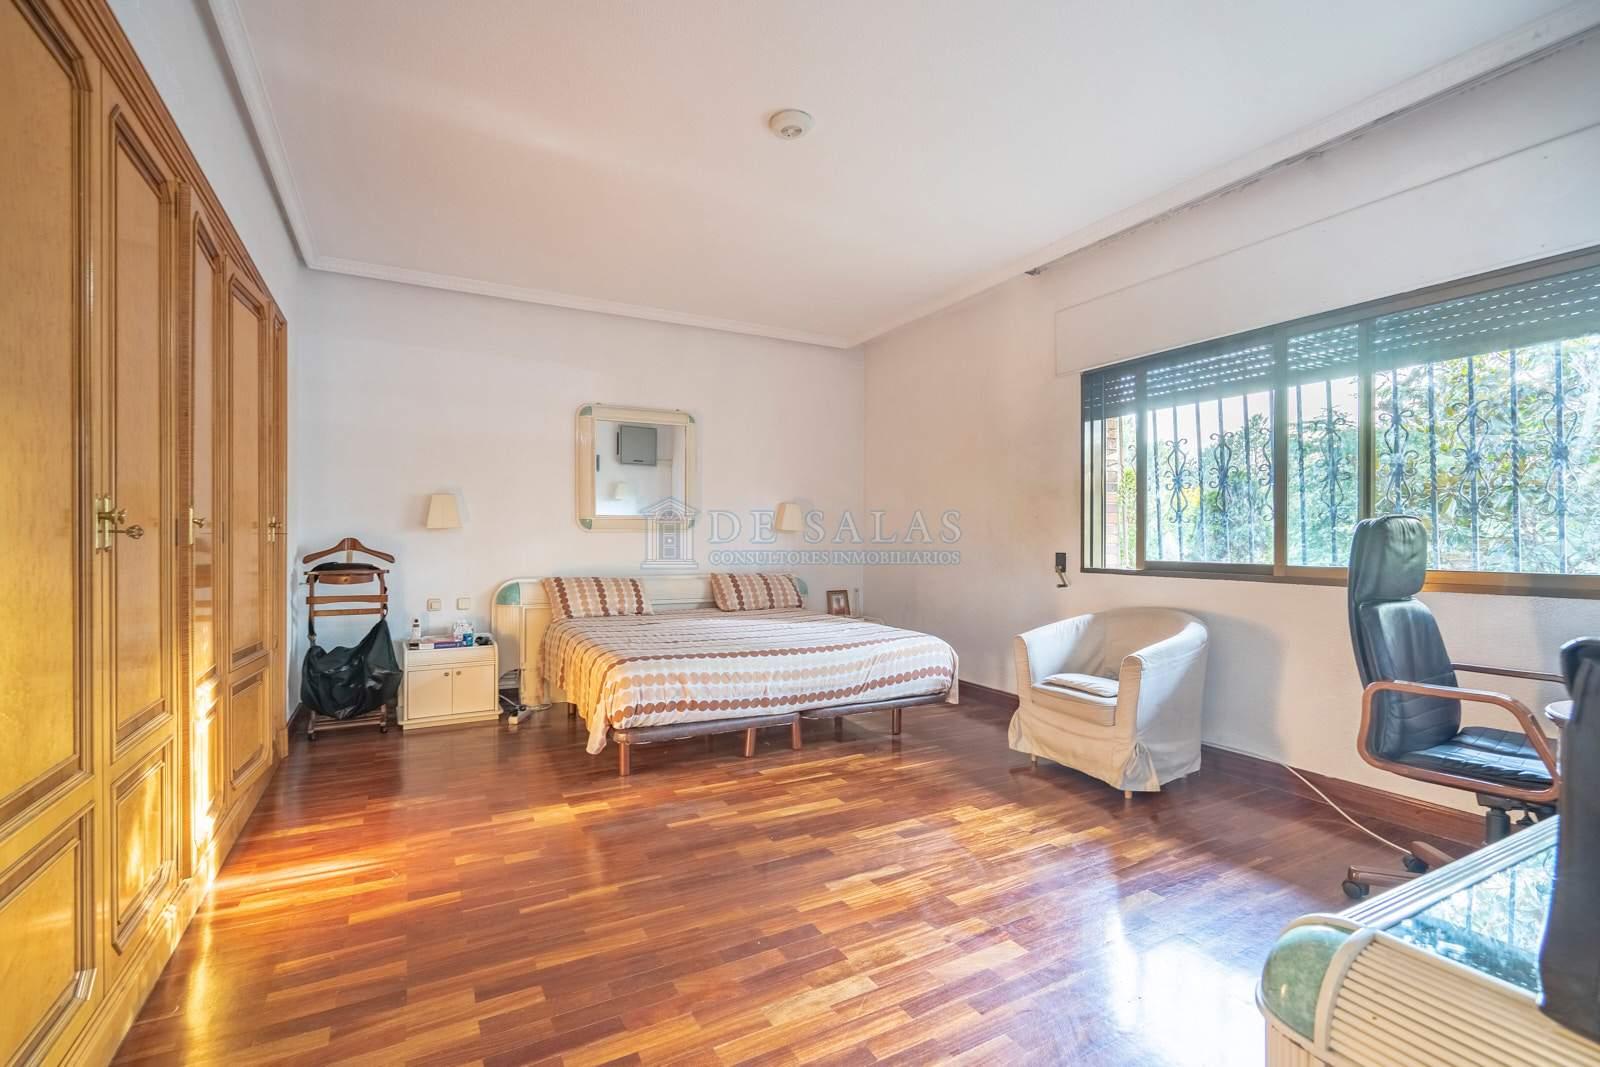 23-Dormitorio Chalet La Moraleja